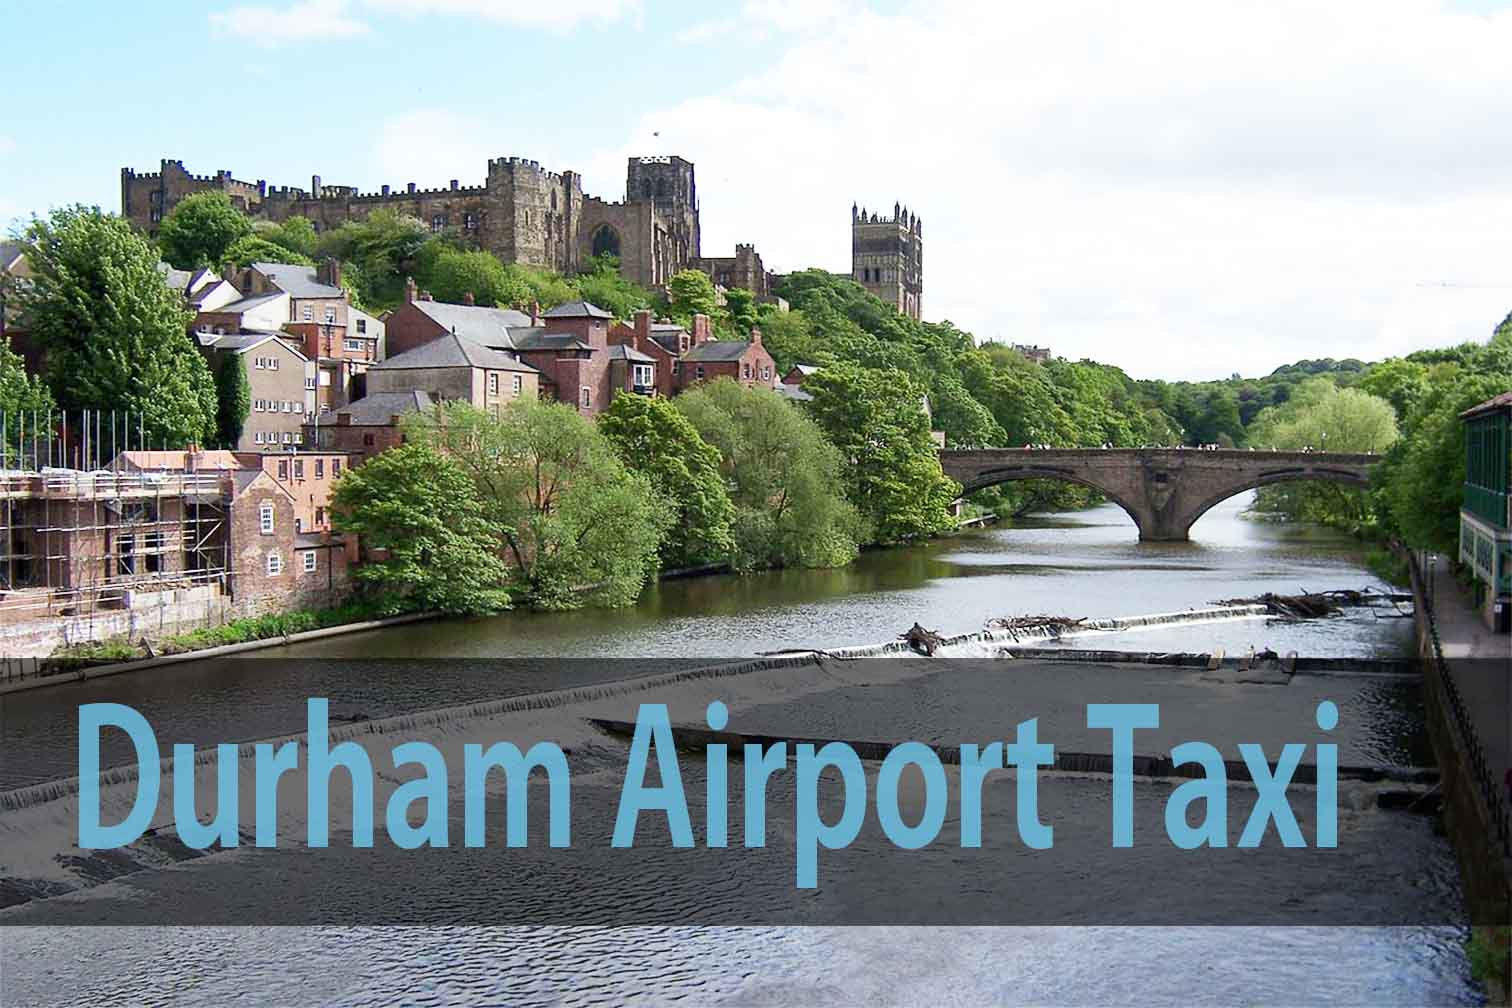 Durham airport taxi